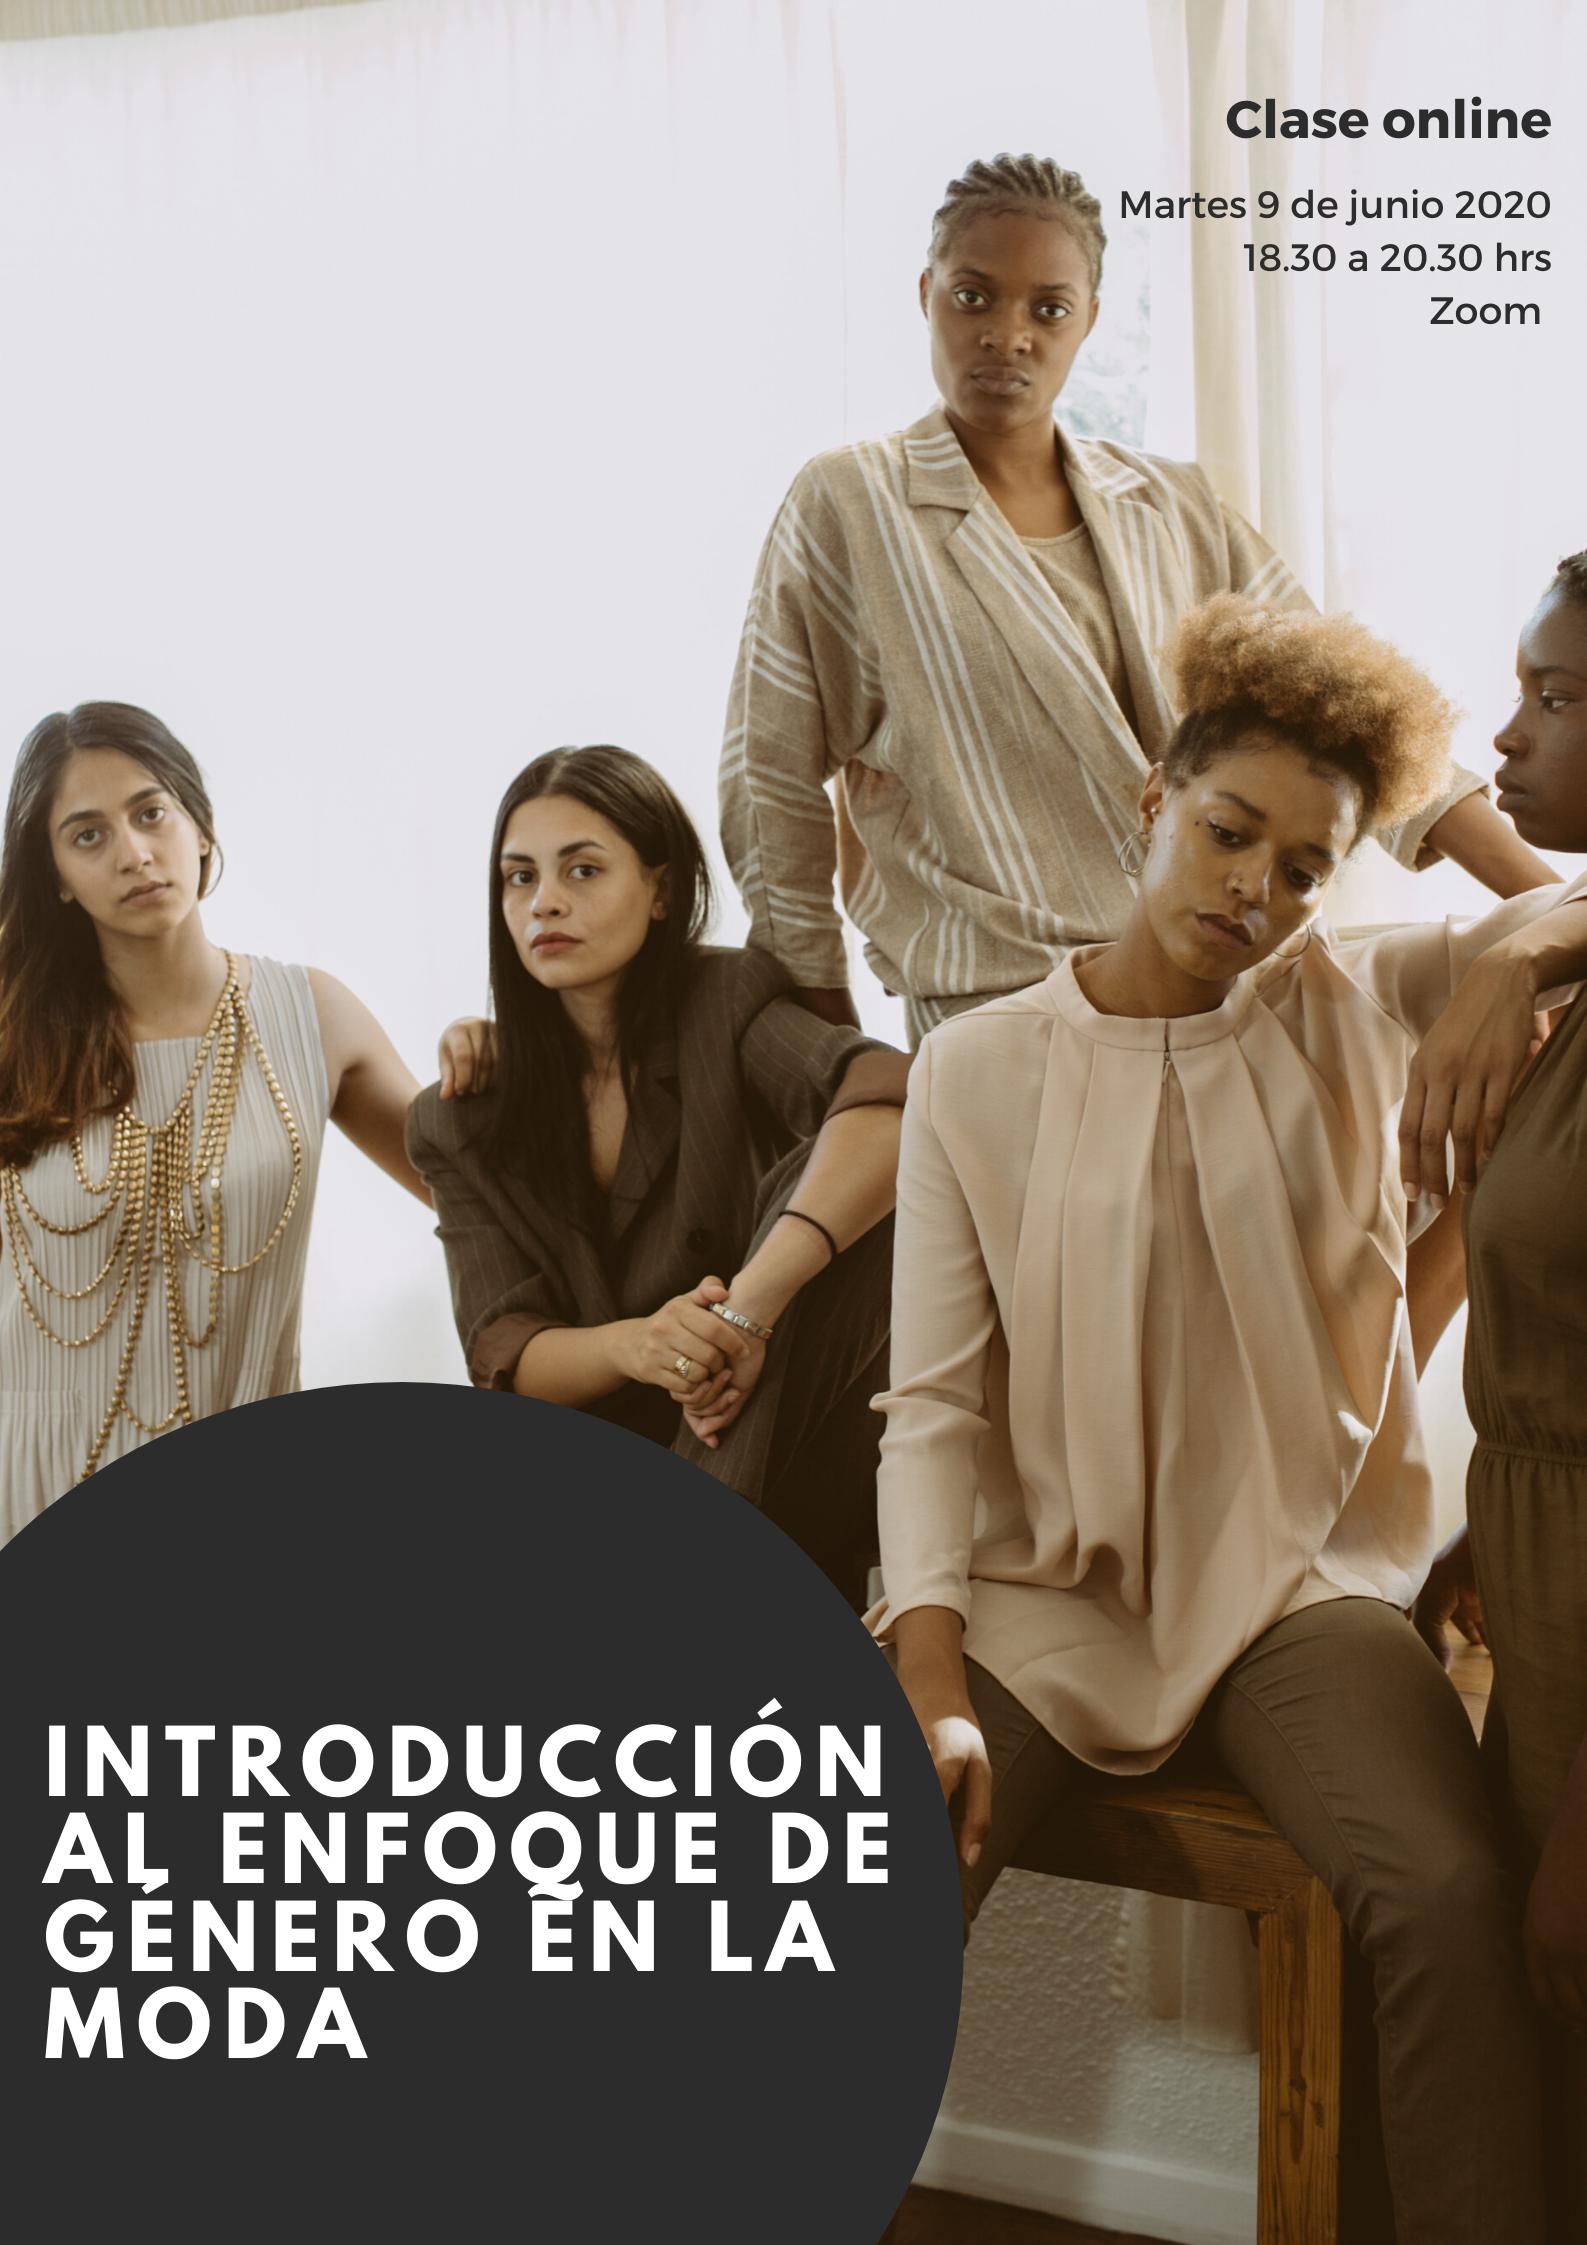 En la foto grupo de mujeres de diversas etnias